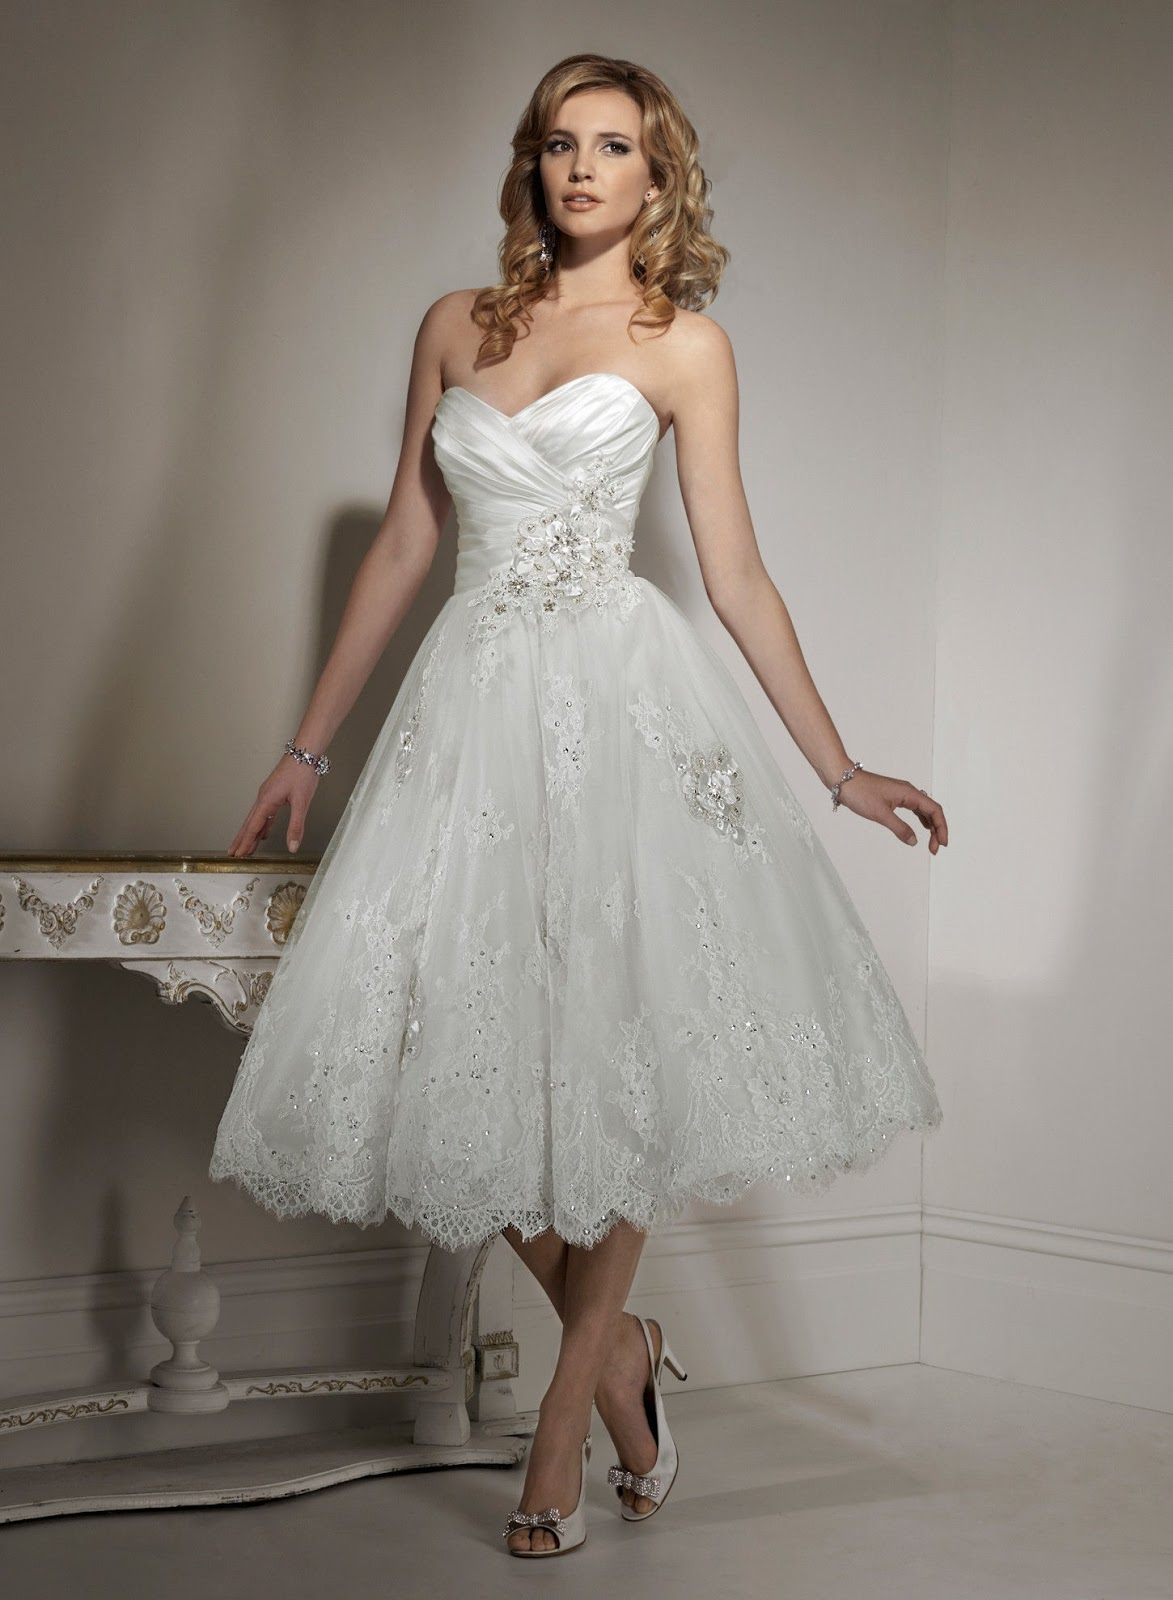 Short Wedding Dress for Petite Women